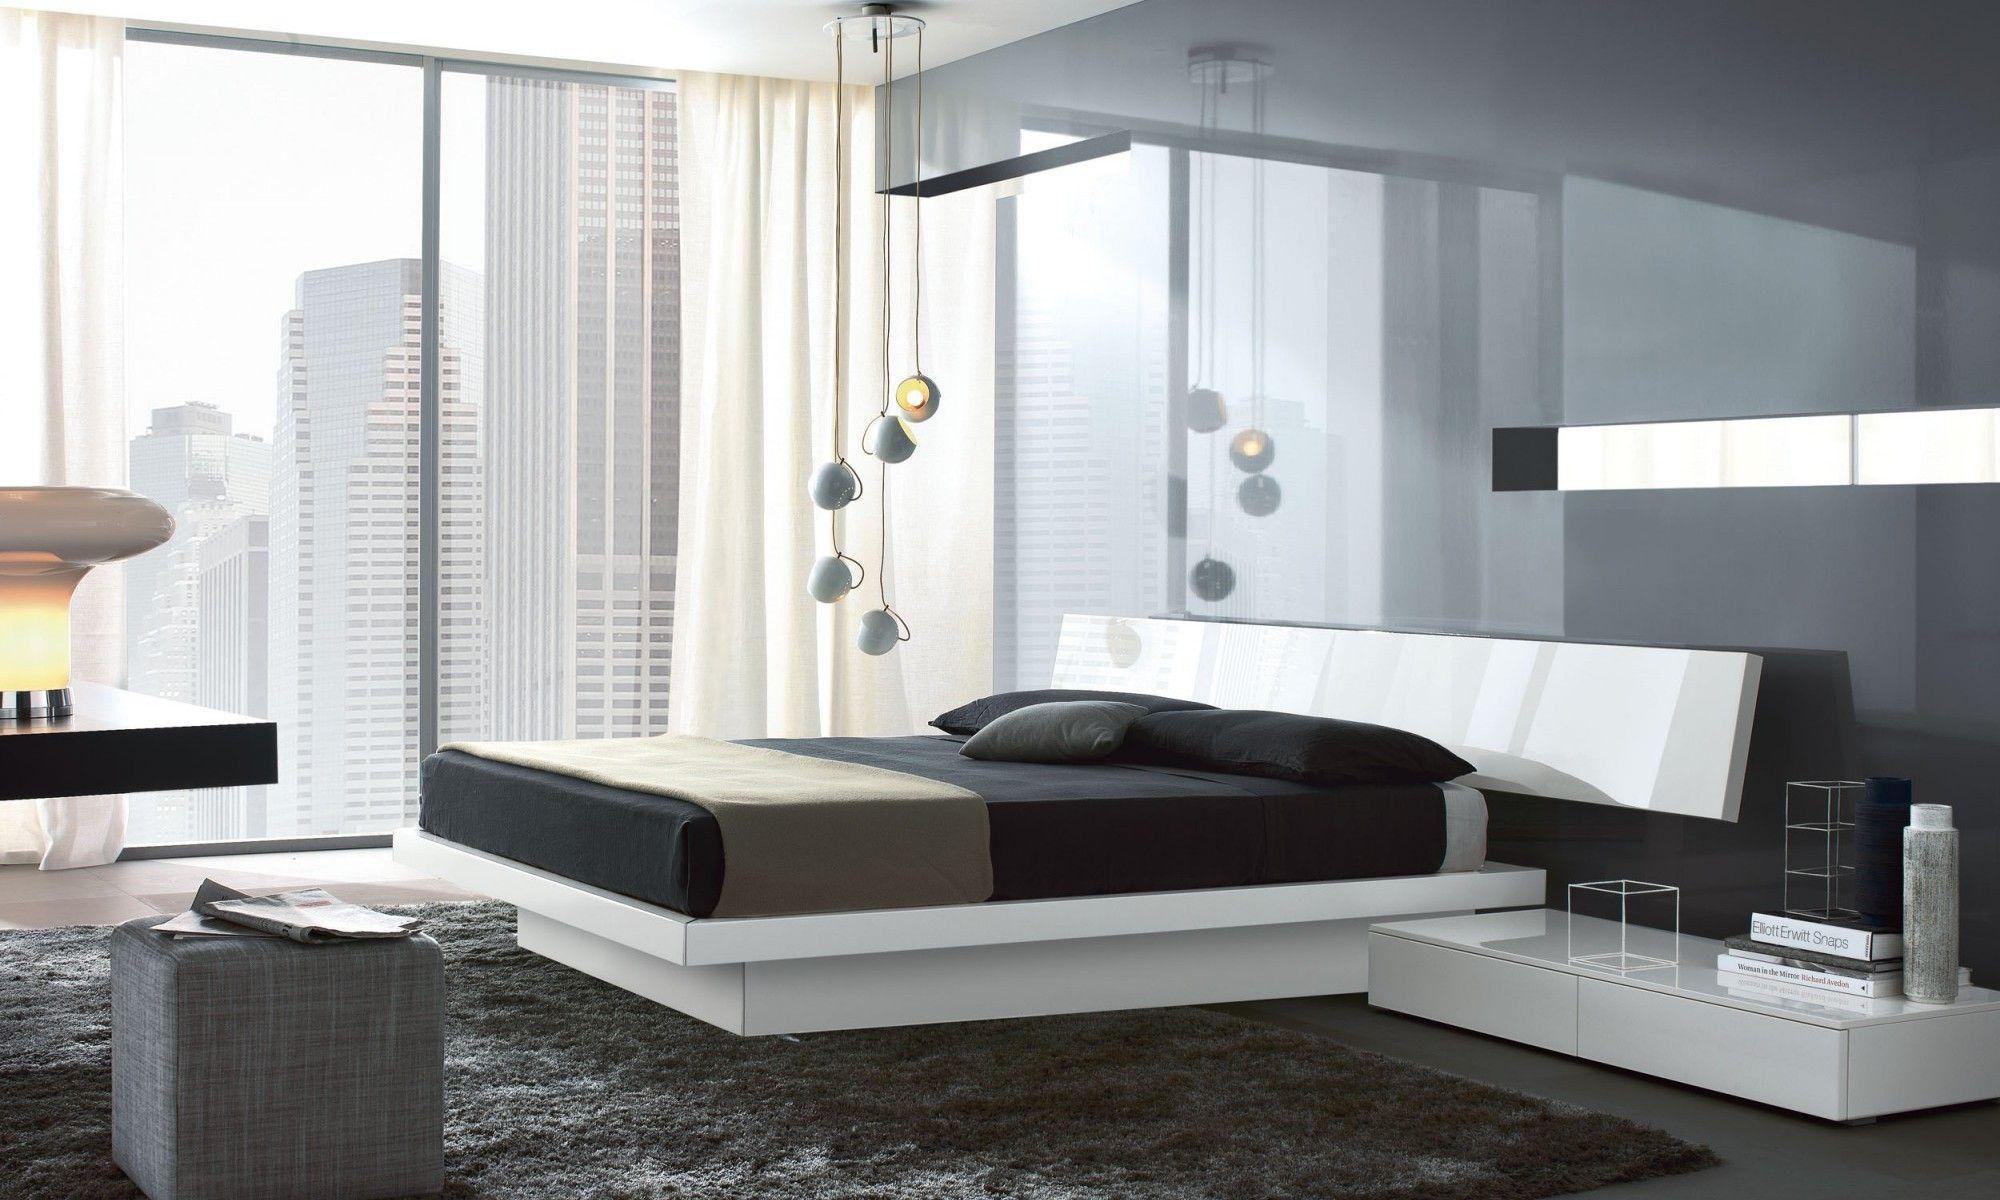 Slim The Fascination Of Asymmetric Design Elegance Created By Balancing Unusual Elements This Is Minimalist Bedroom Decor Minimalist Bedroom Minimalist Bed